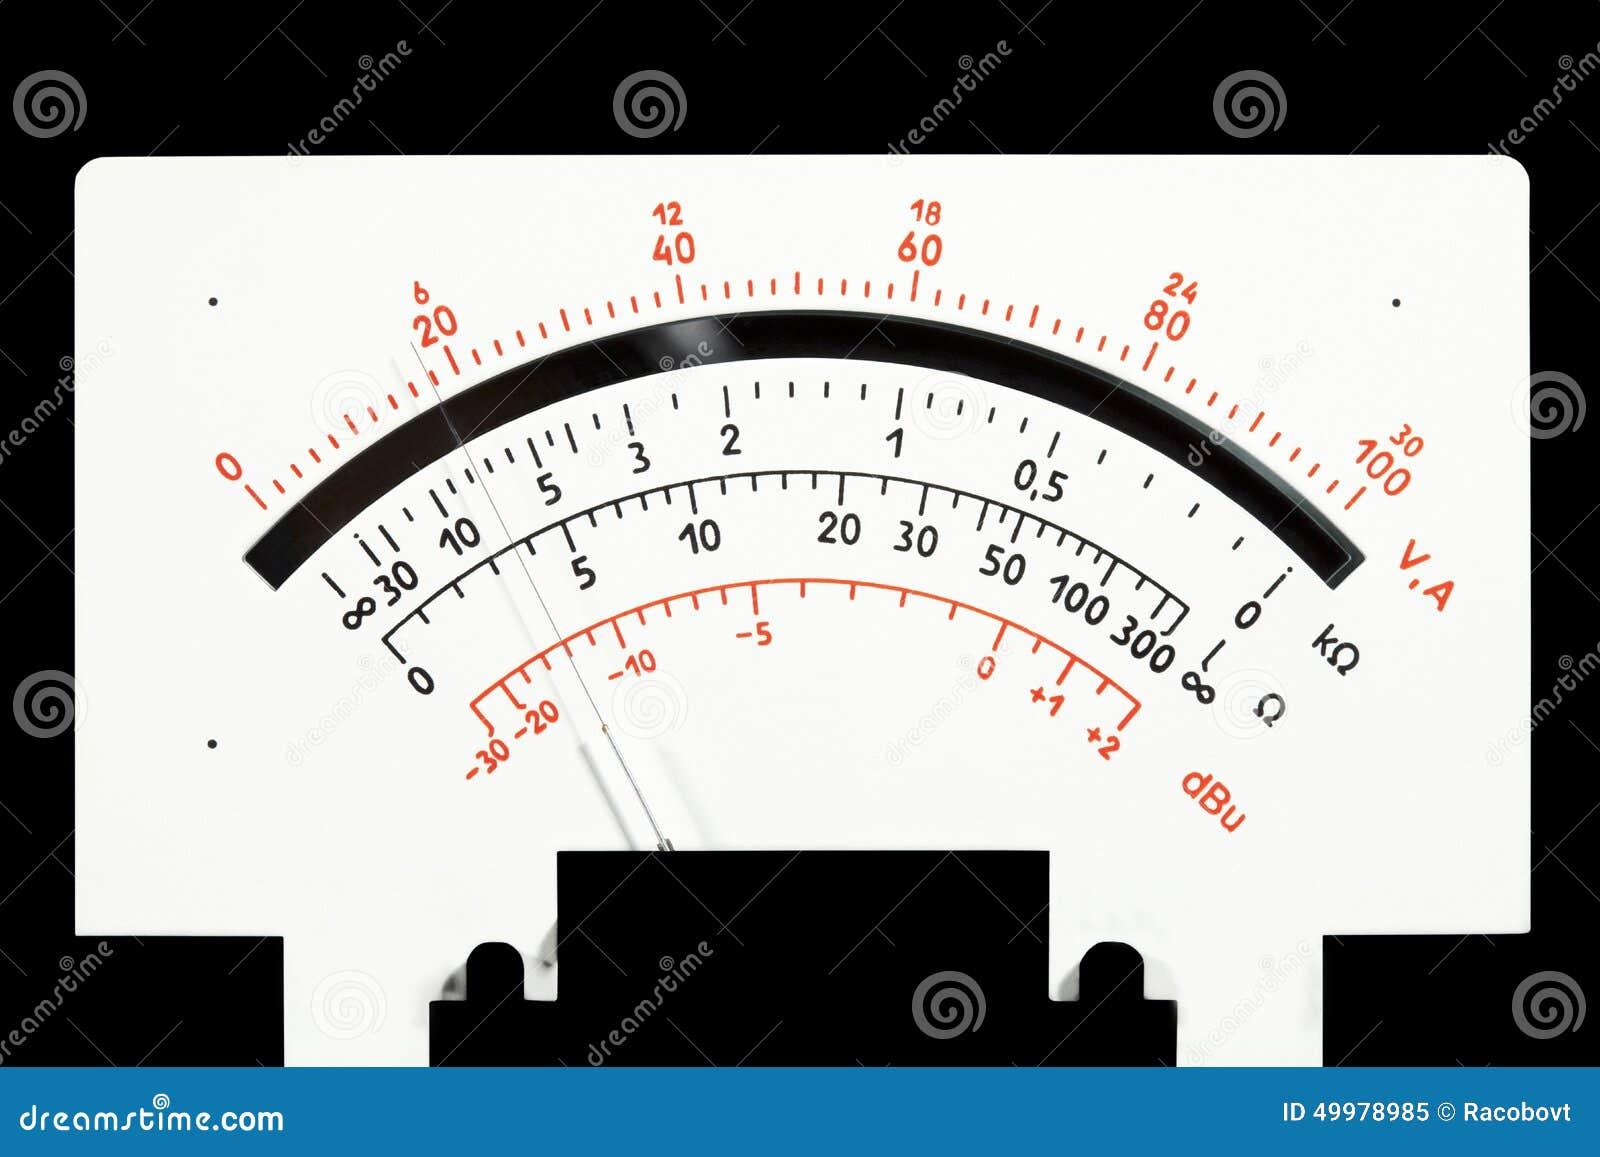 Analog Meter Background : Scale analog multimeter stock photo image